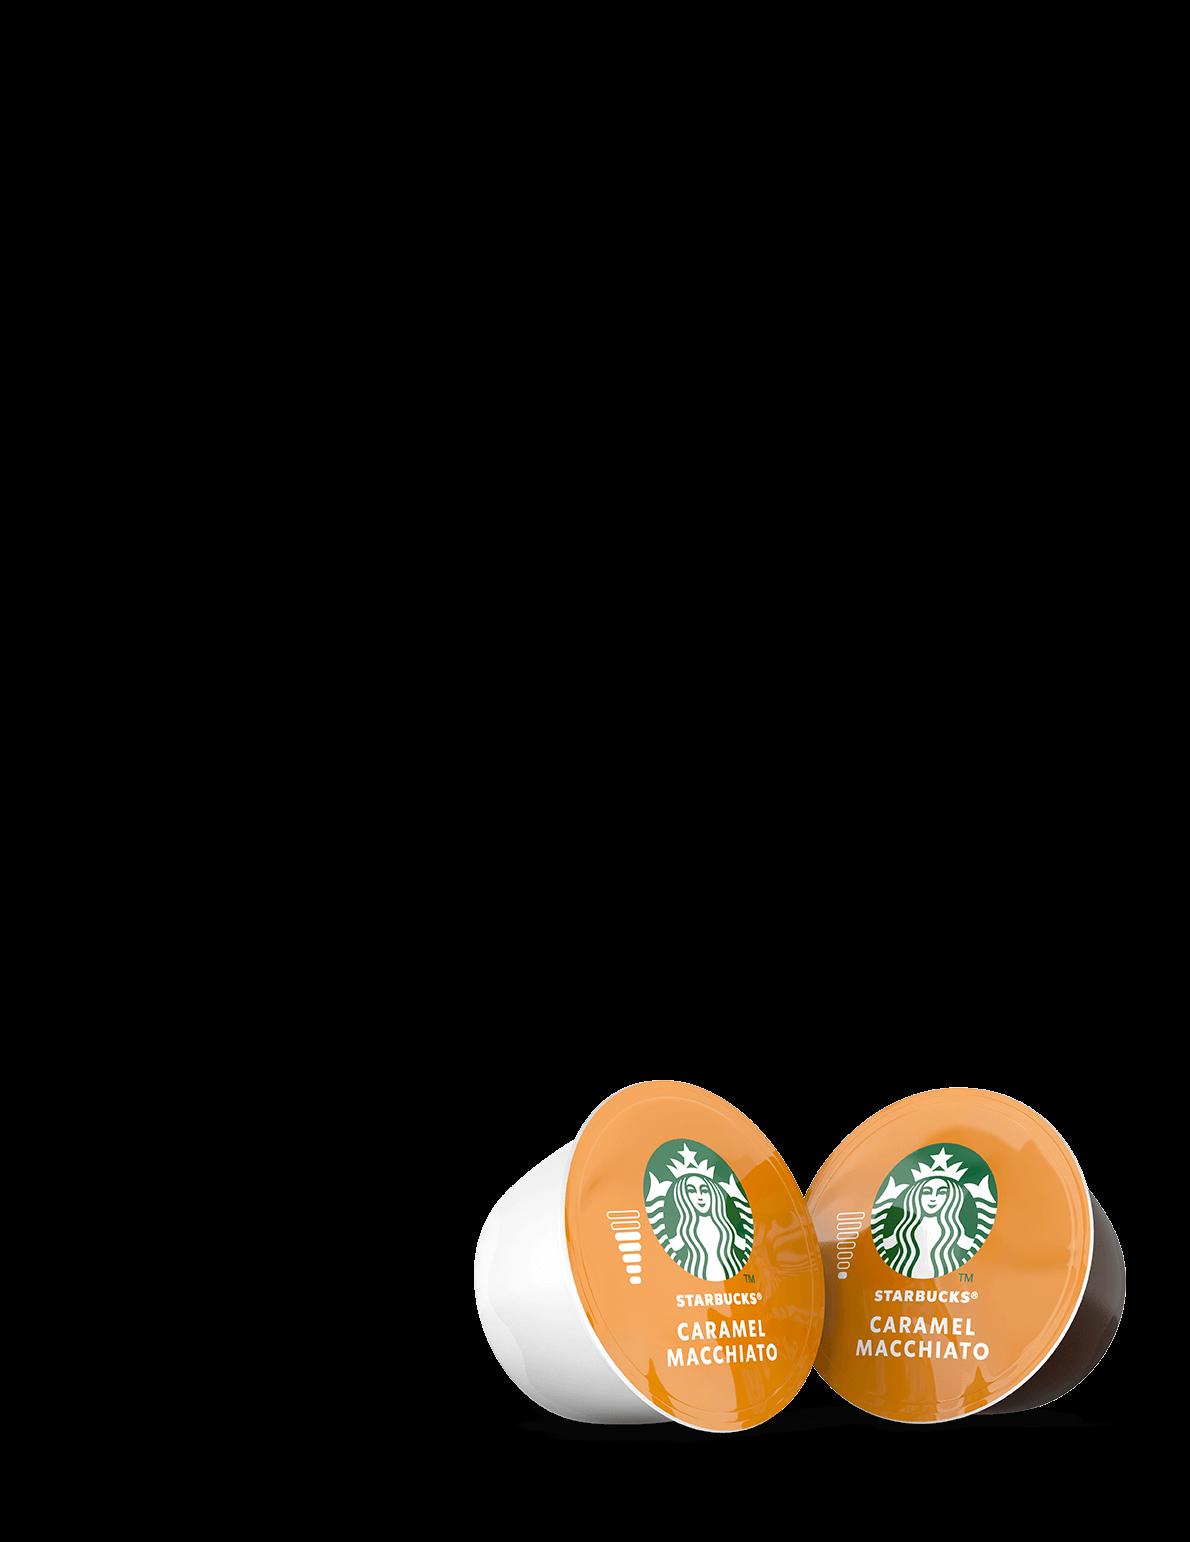 Cápsulas Starbucks® Caramel Macchiato